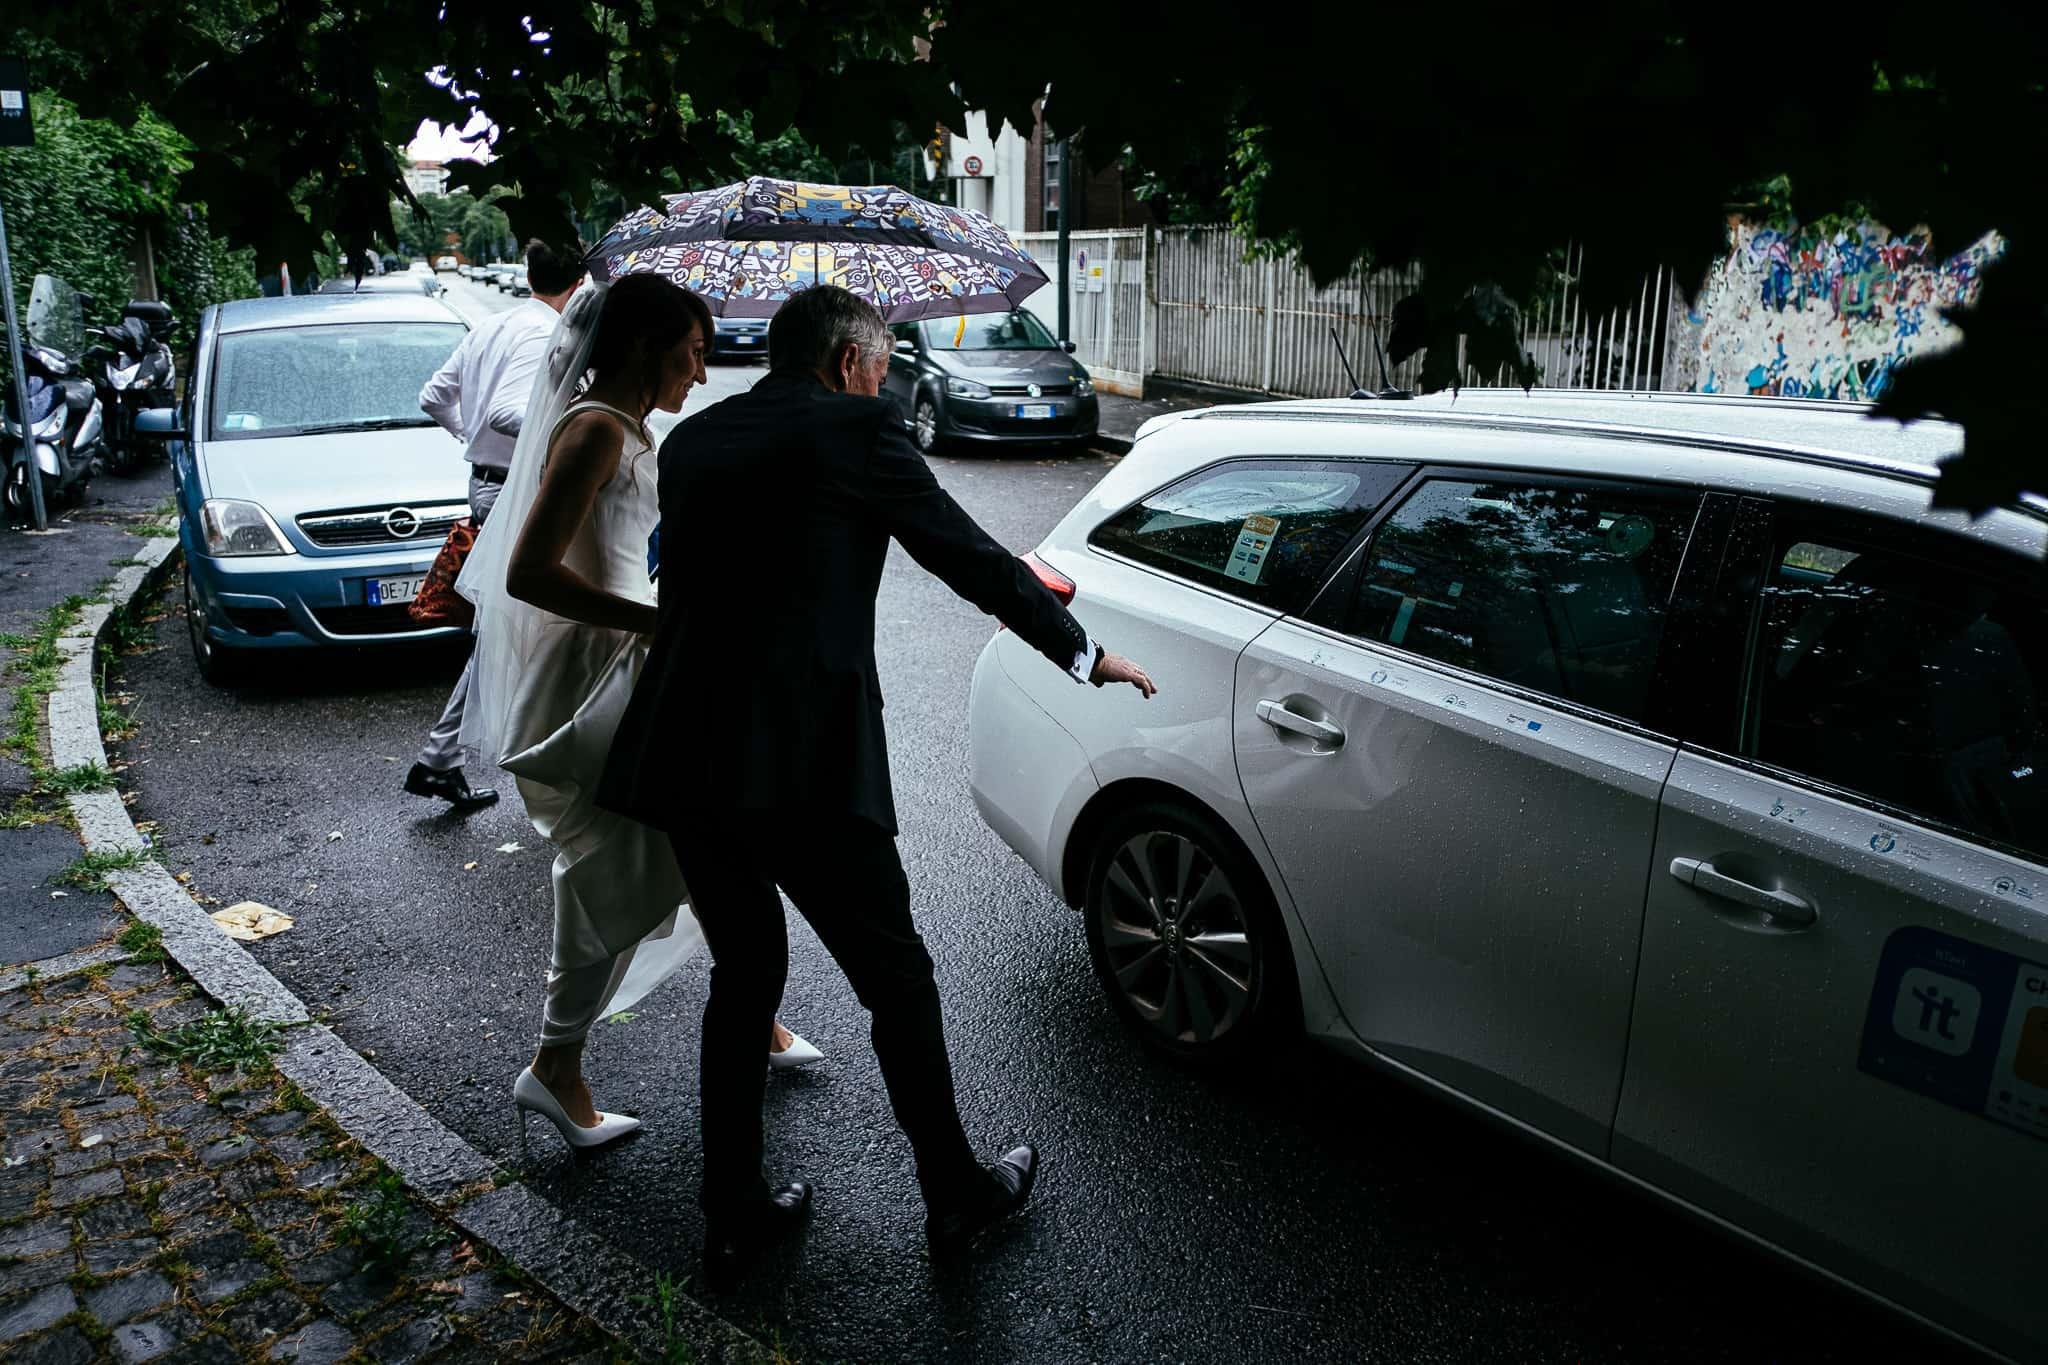 matrimonio Canter Milano San siro Luca rossi wedding reportage 0023